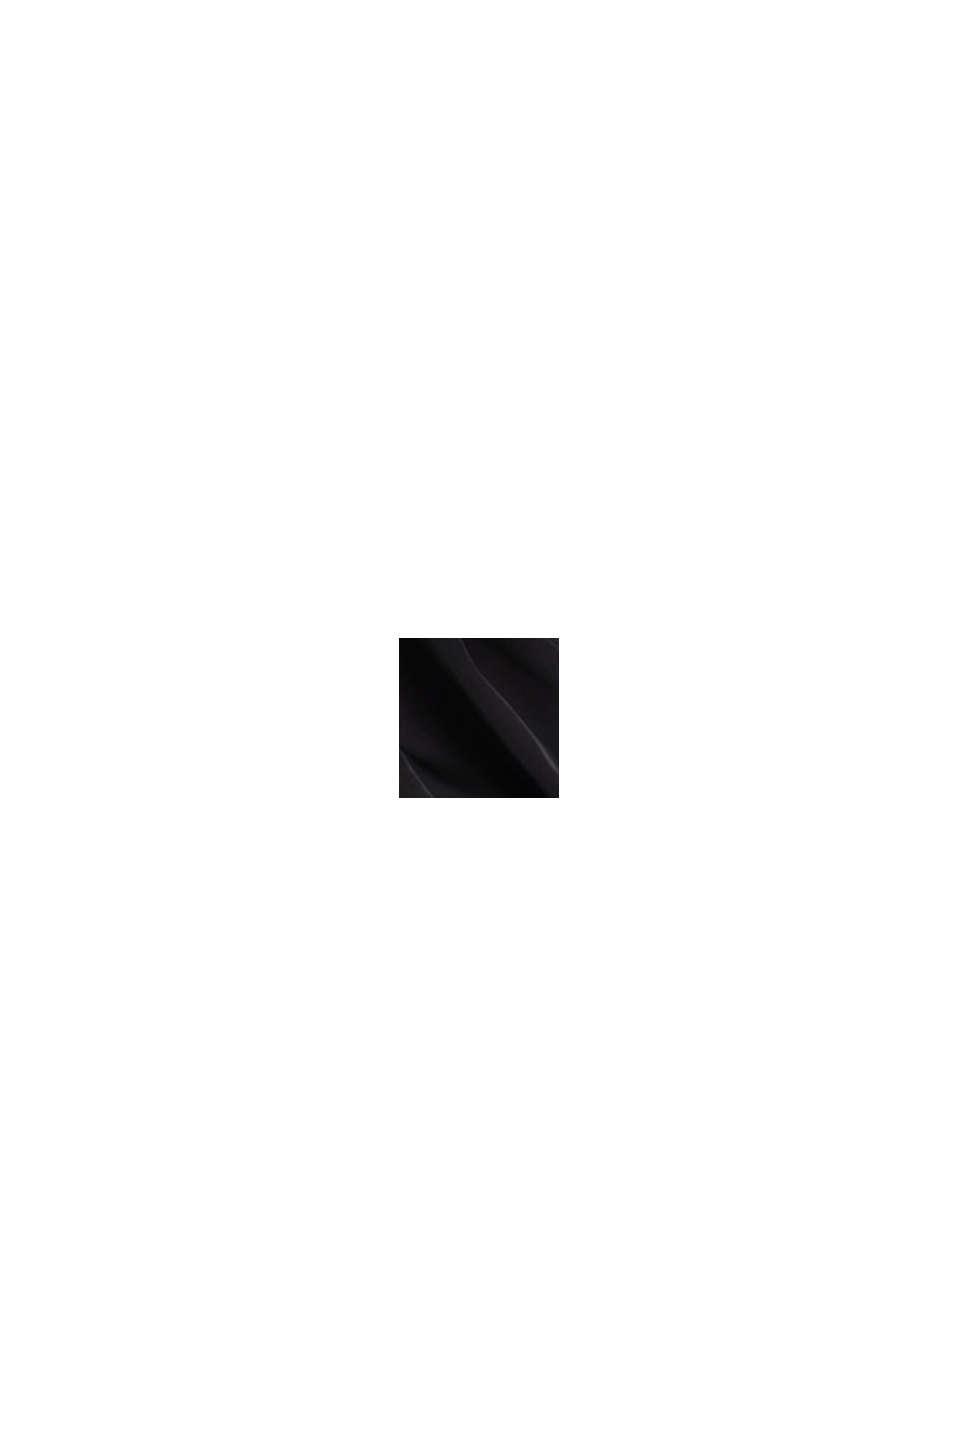 SATIN Mix + Match żakiet, BLACK, swatch